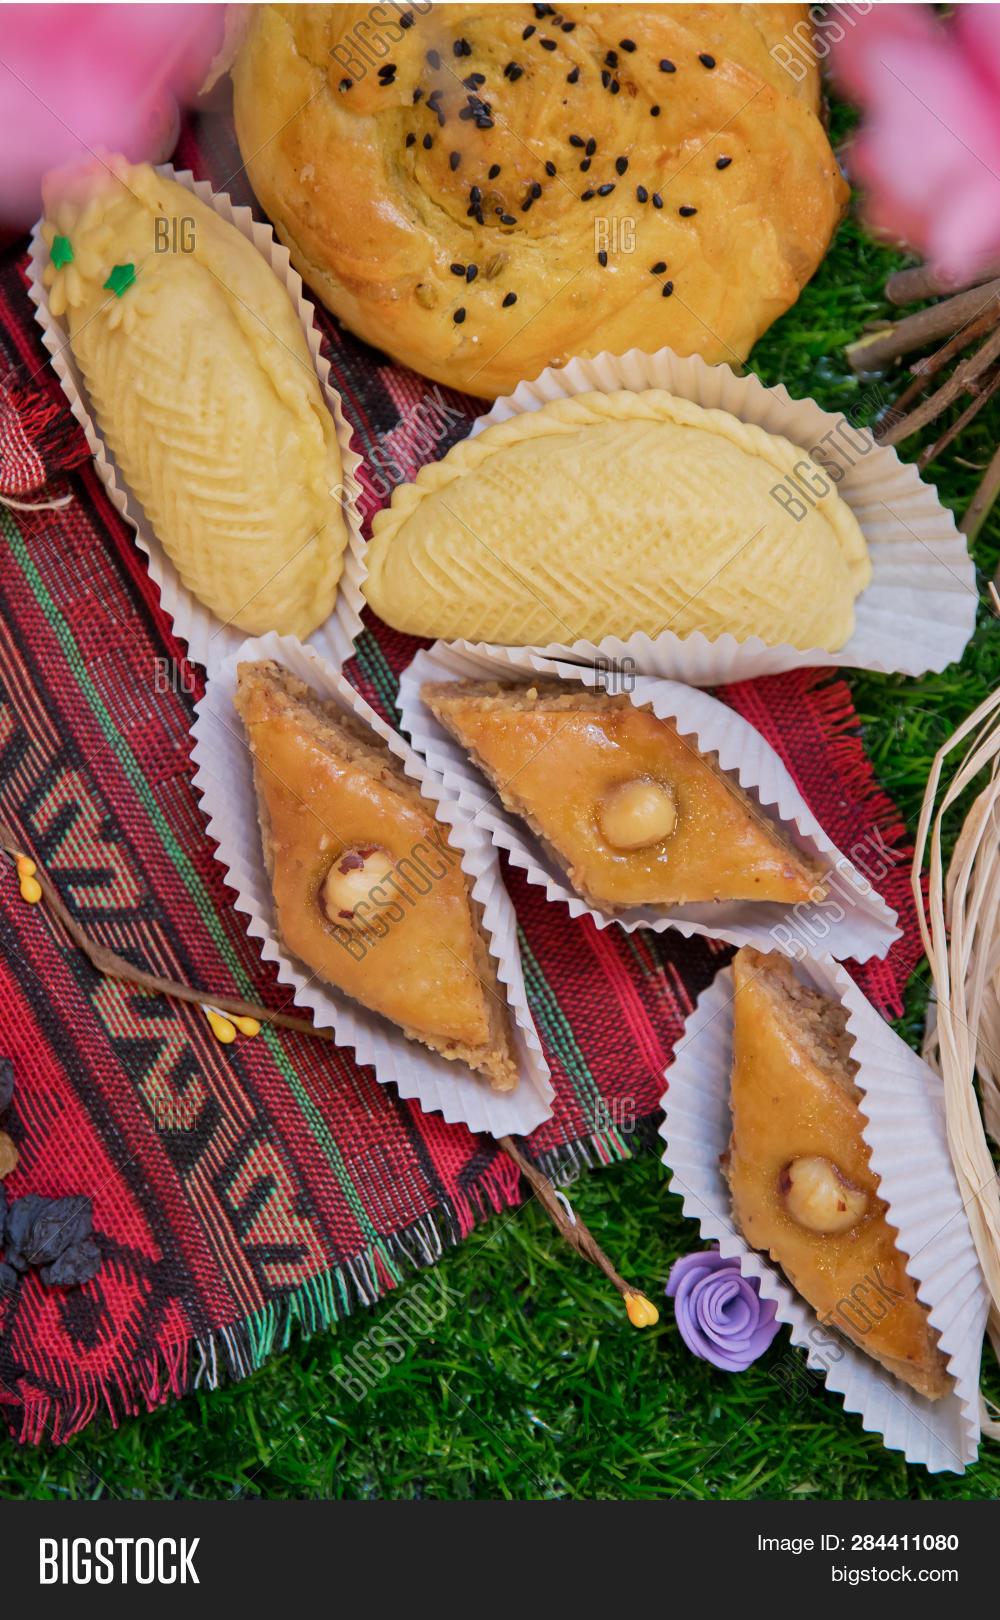 Azerbaijani Sweetness Image & Photo (Free Trial) | Bigstock